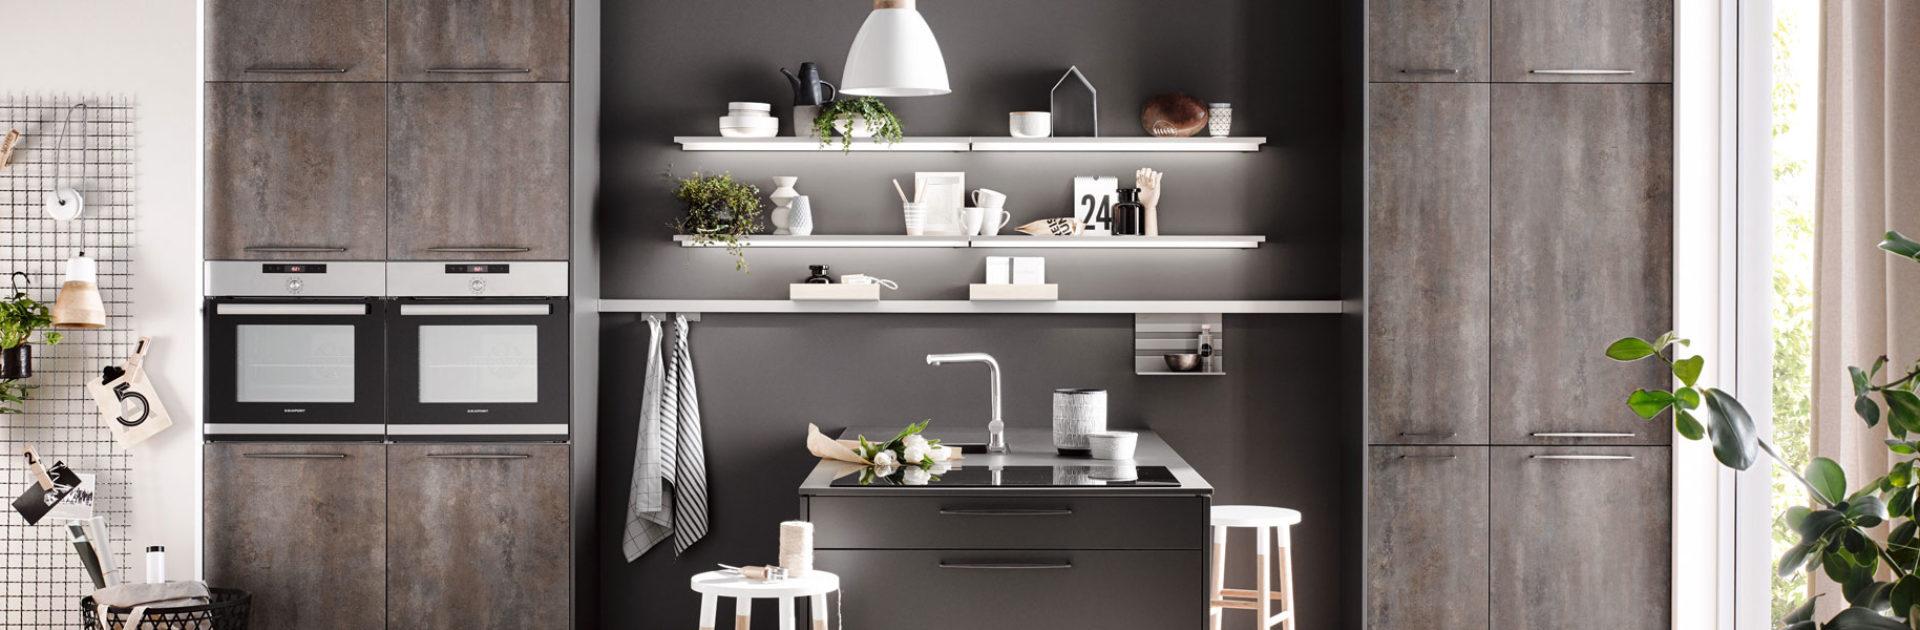 Tips open keuken | Satink Keukens & Badkamers